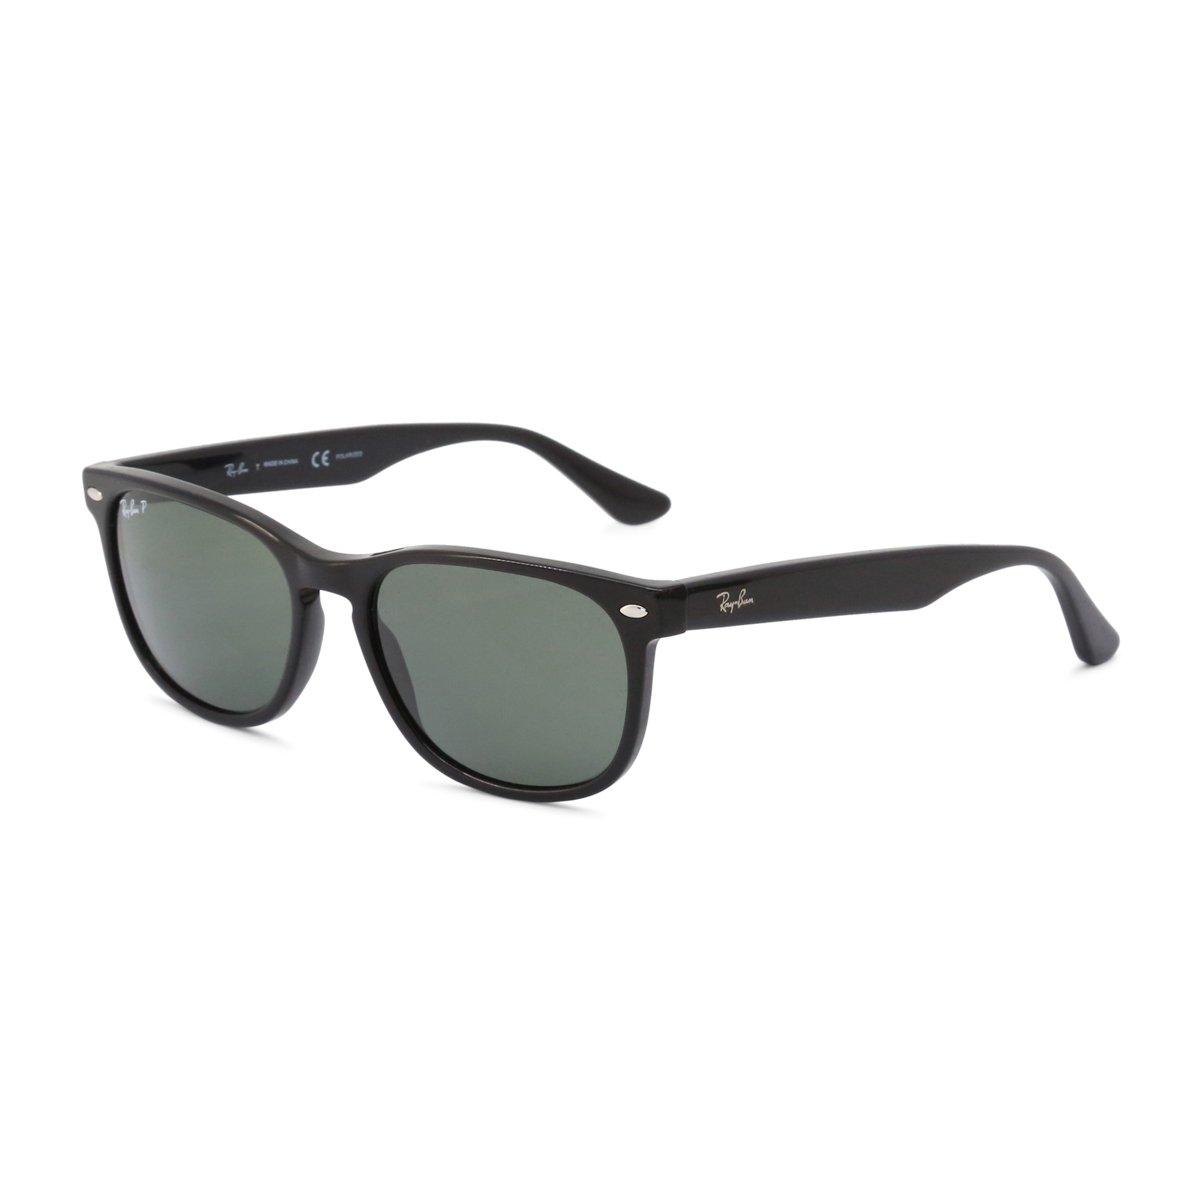 Ray-Ban Unisex Sunglasses Various Colours 0RB2184 - black NOSIZE